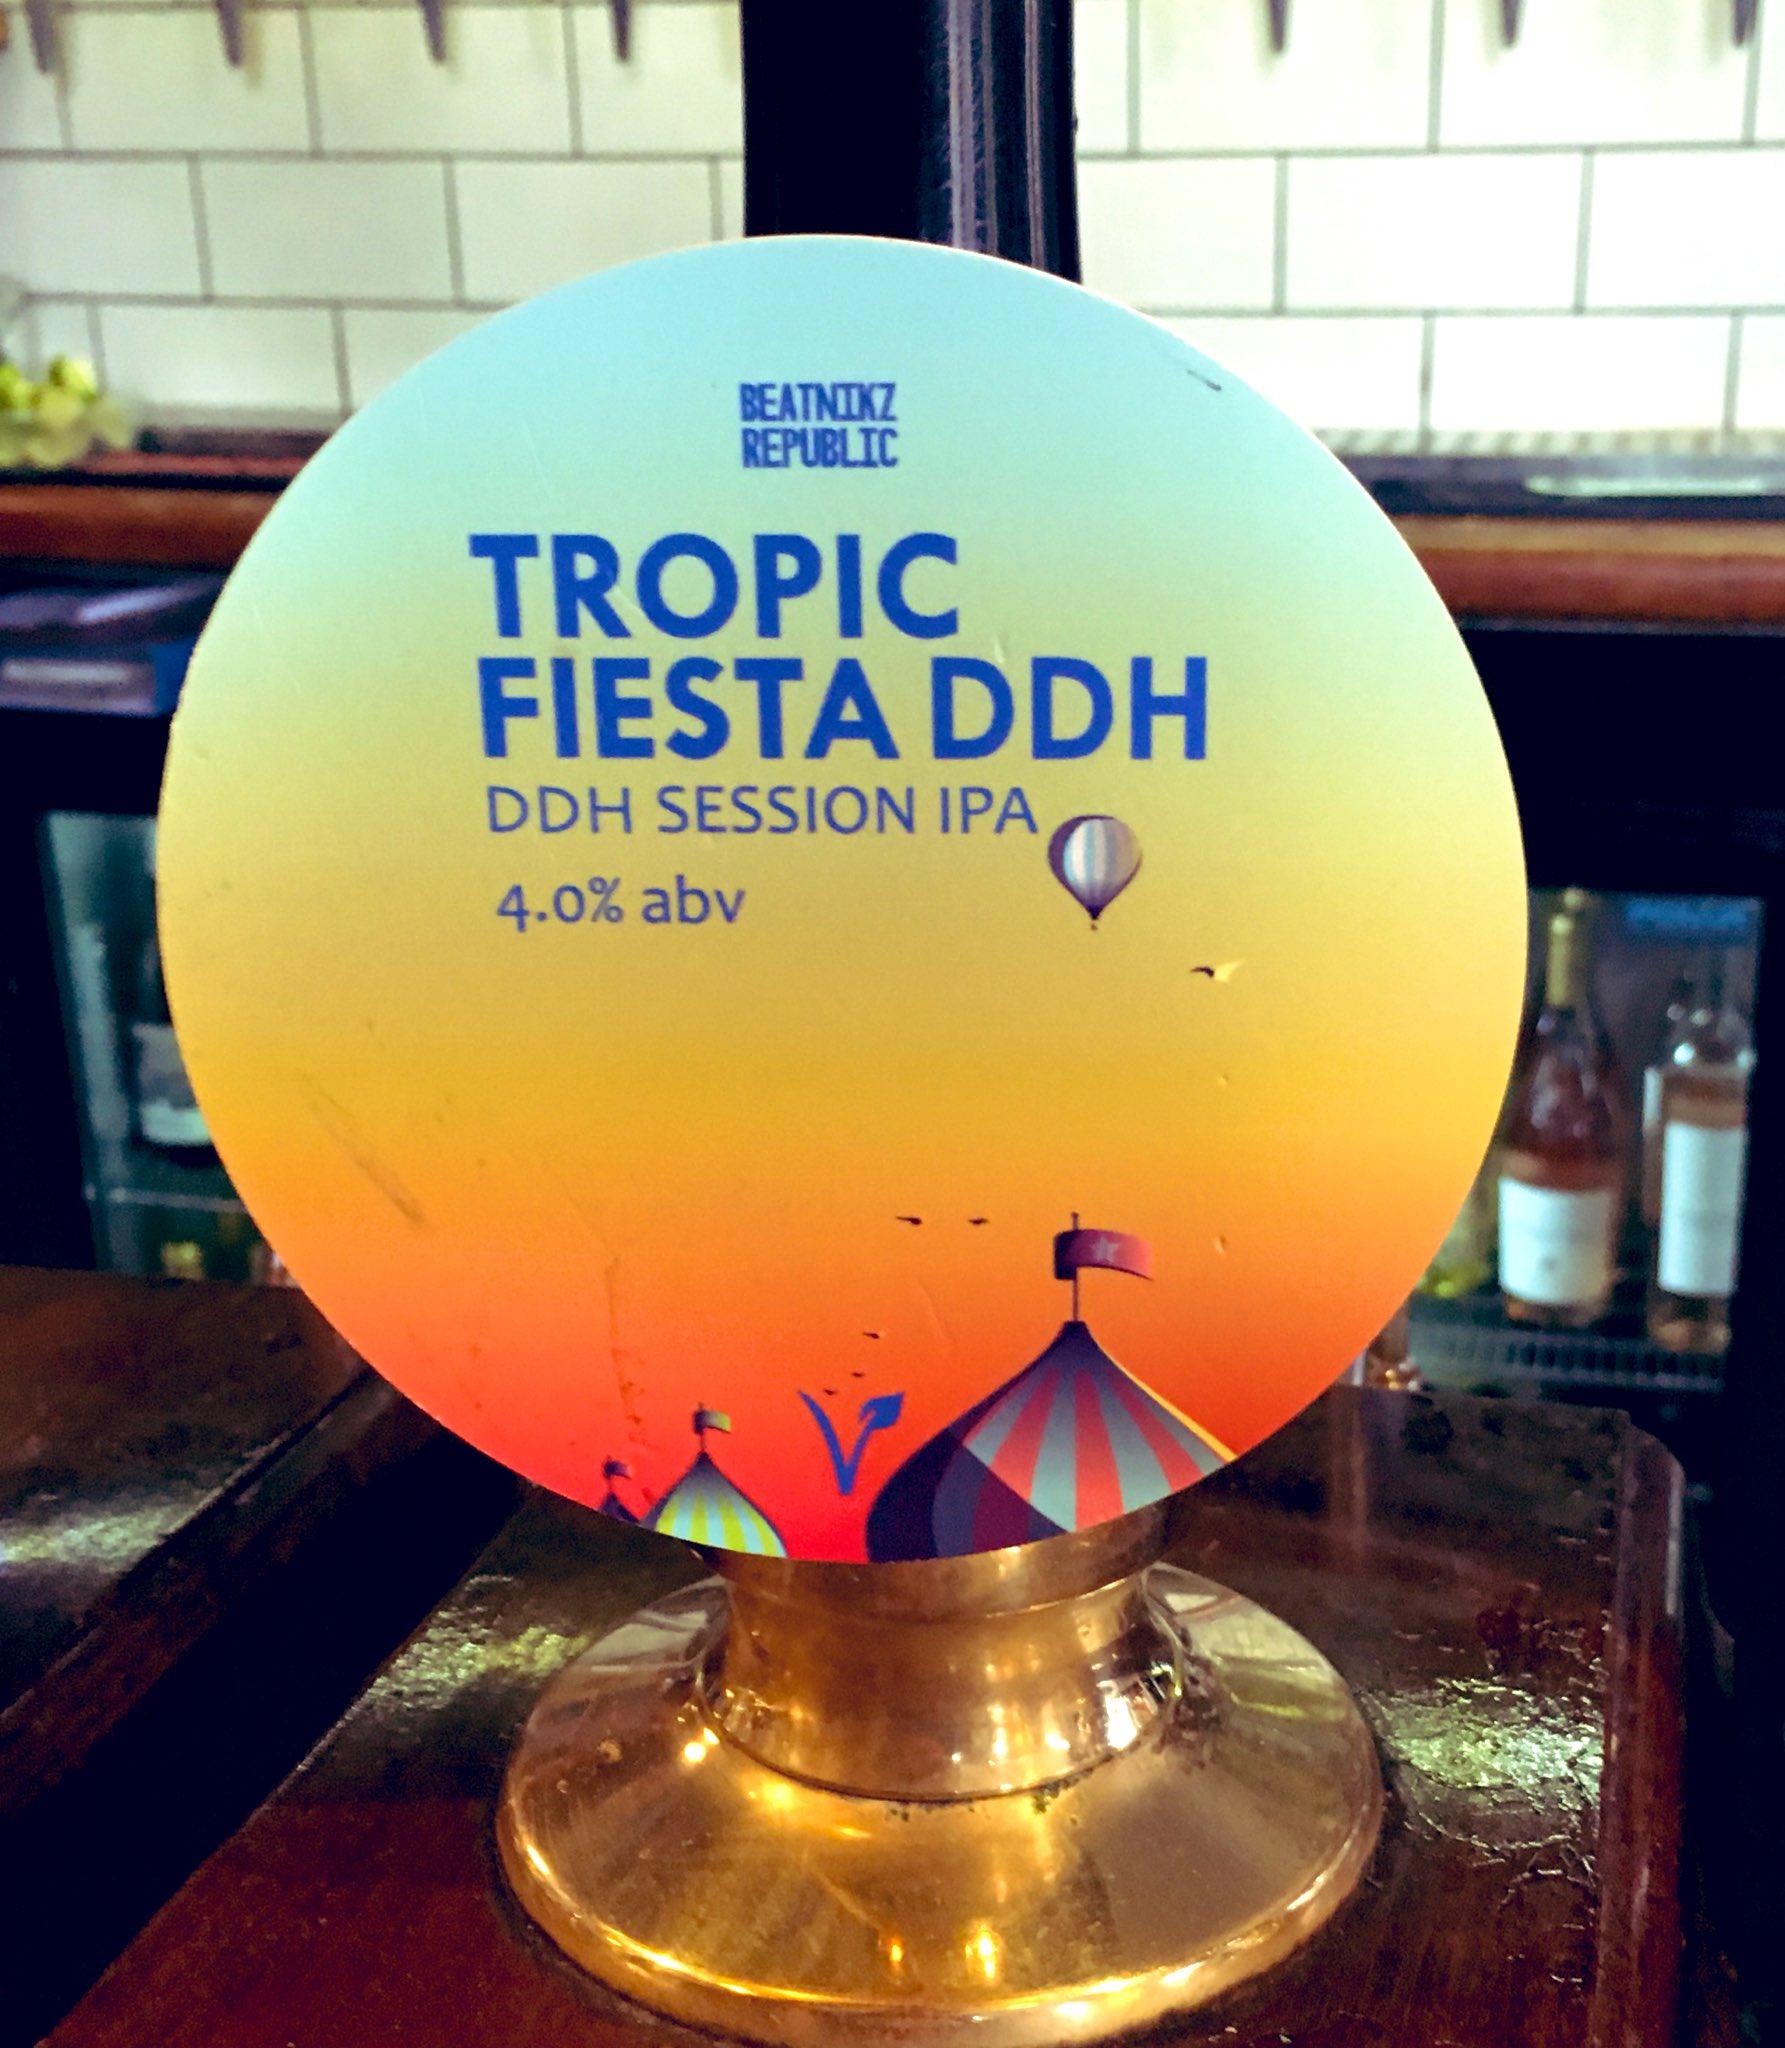 156: Tropic Fiesta DDH